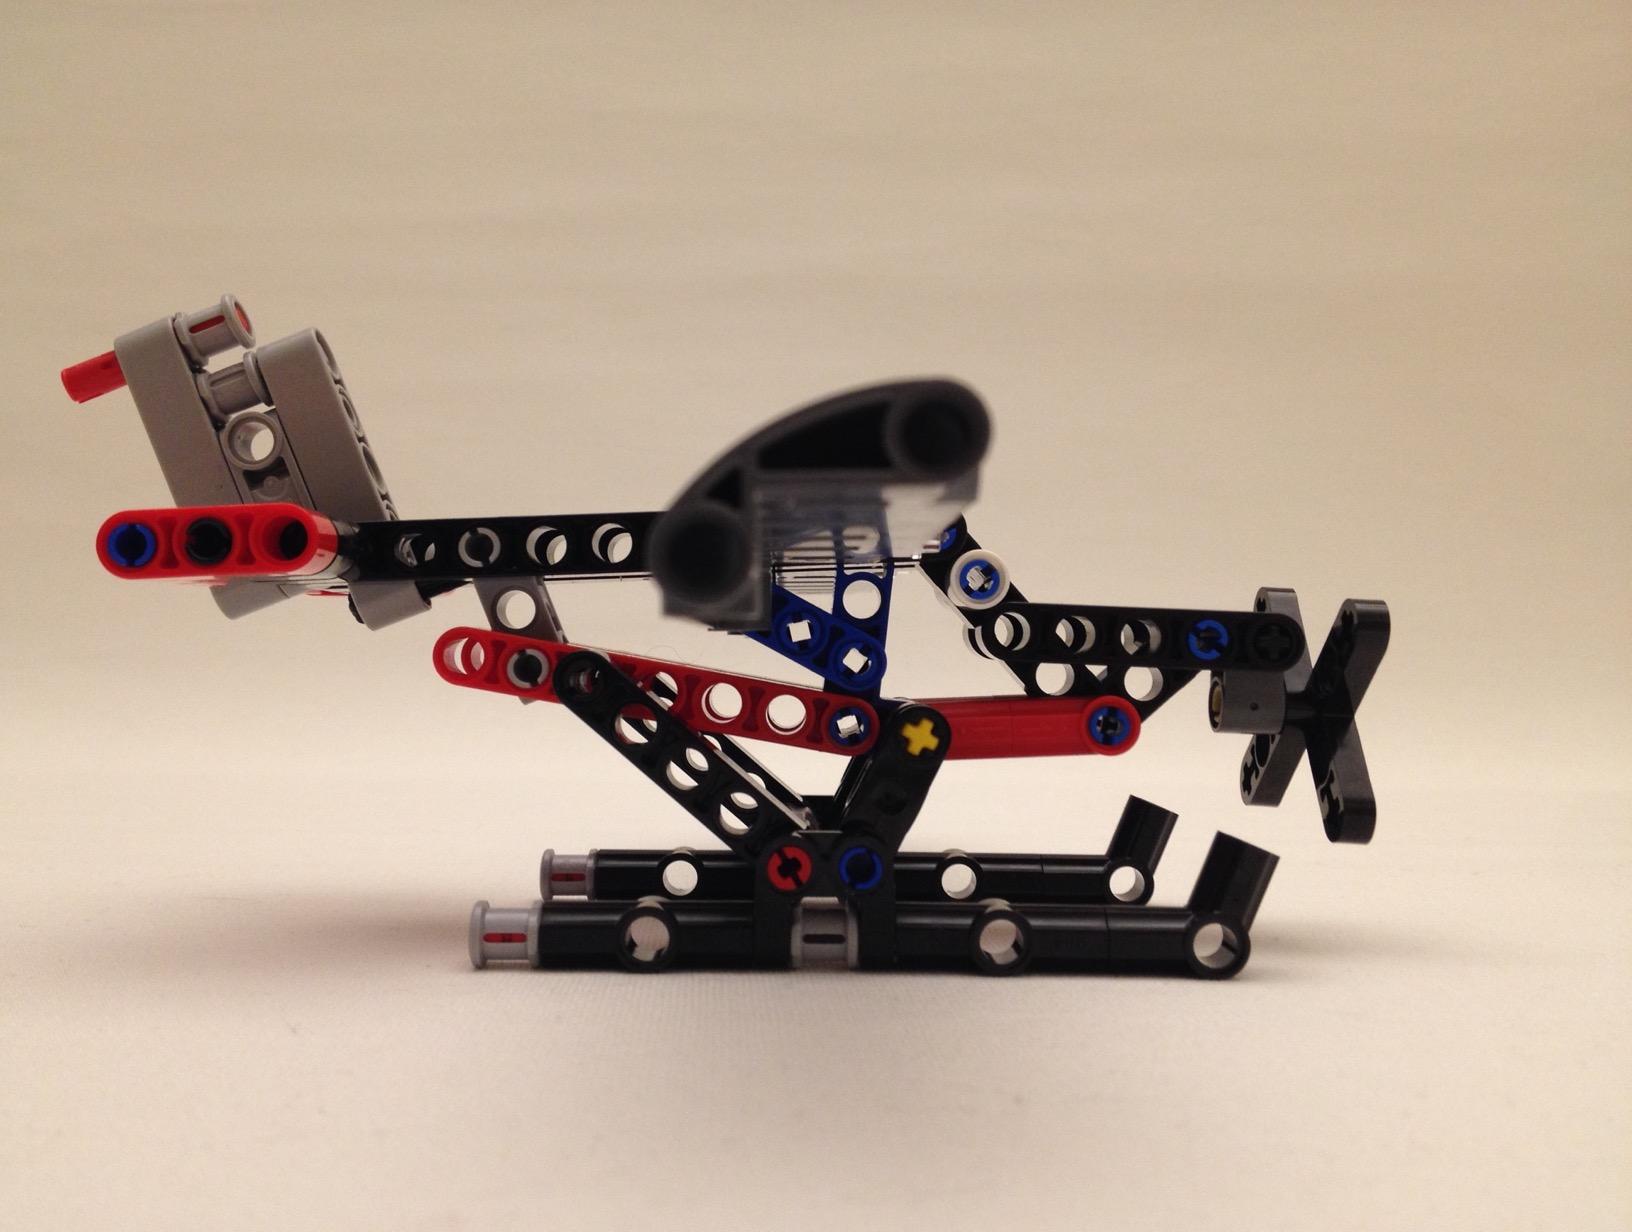 Lego floatplane, side view